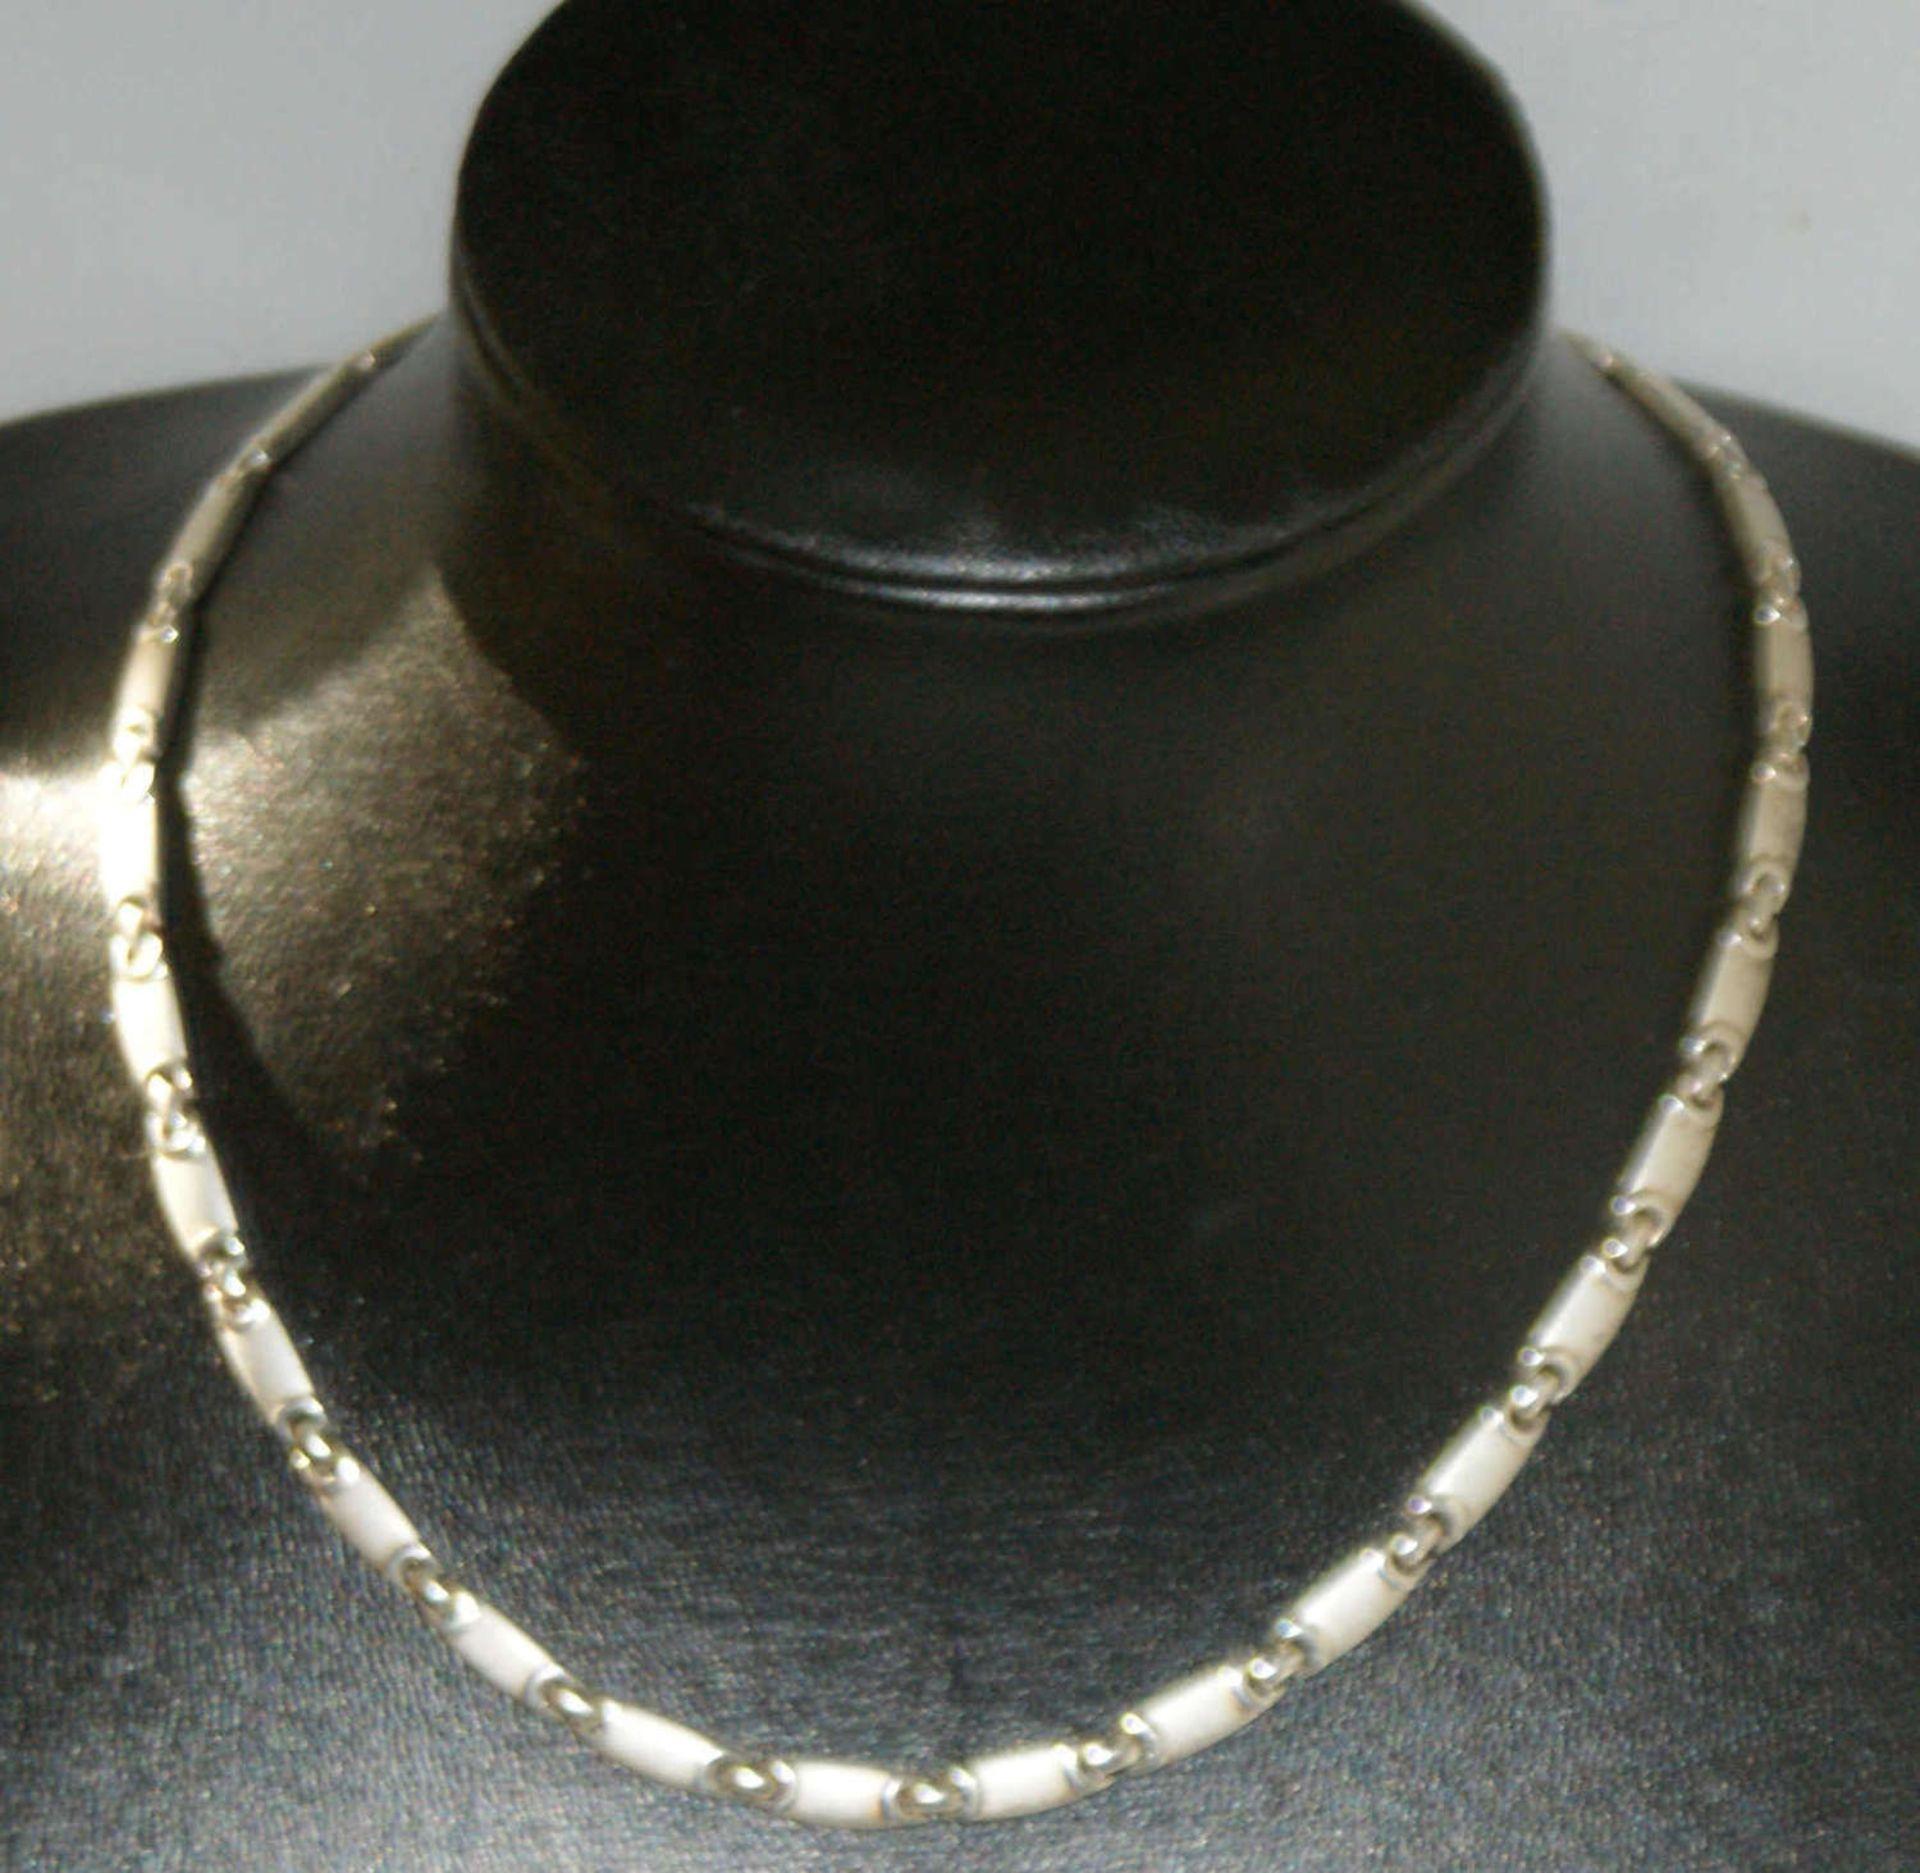 Silbercollier, 925er Silber, moderne Form. Länge ca. 45 cm.Gewicht ca. 47 gr.